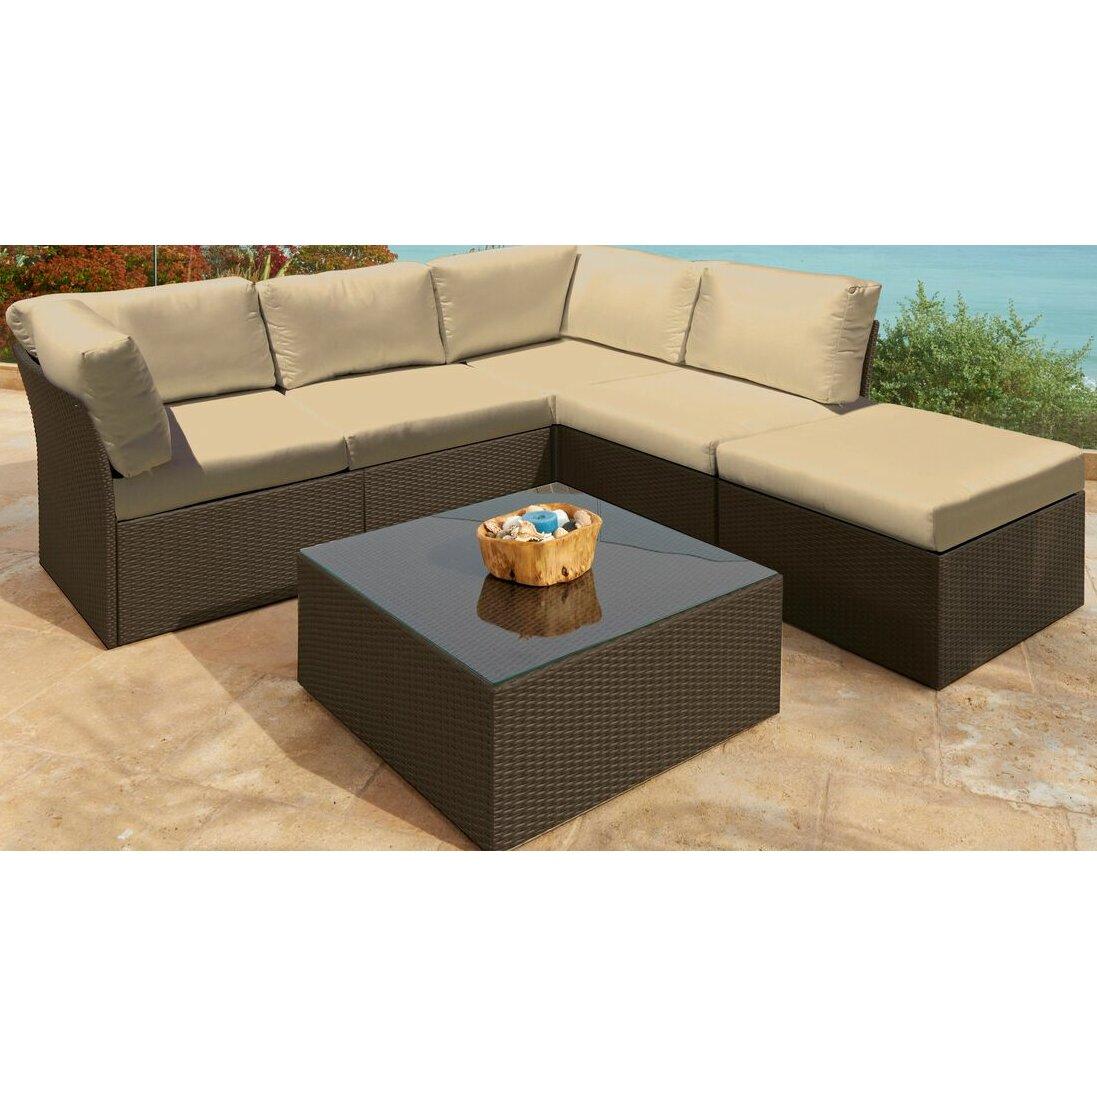 Backyard Porch Hilton Head : Outdoor Patio Furniture  45 Person Conversation Sets Forever Patio